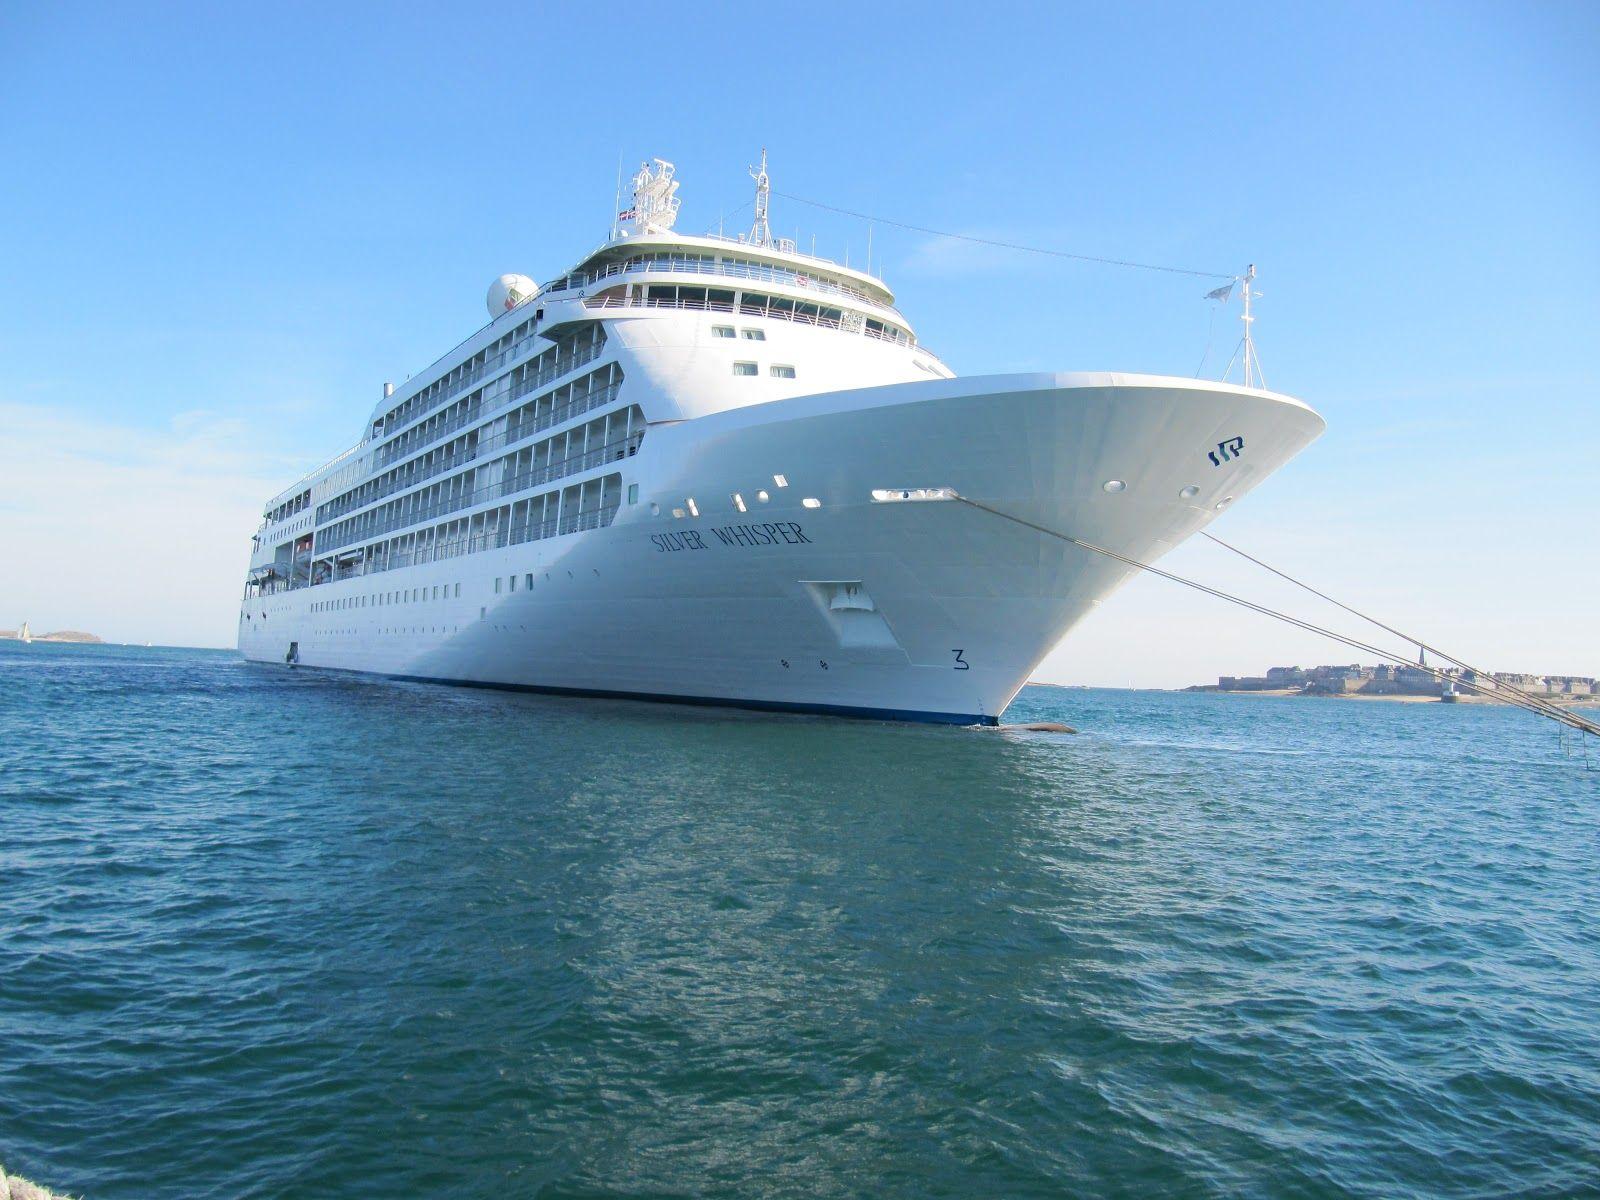 Wild Planet Adventures Small Ship Cruises - Small ship cruises